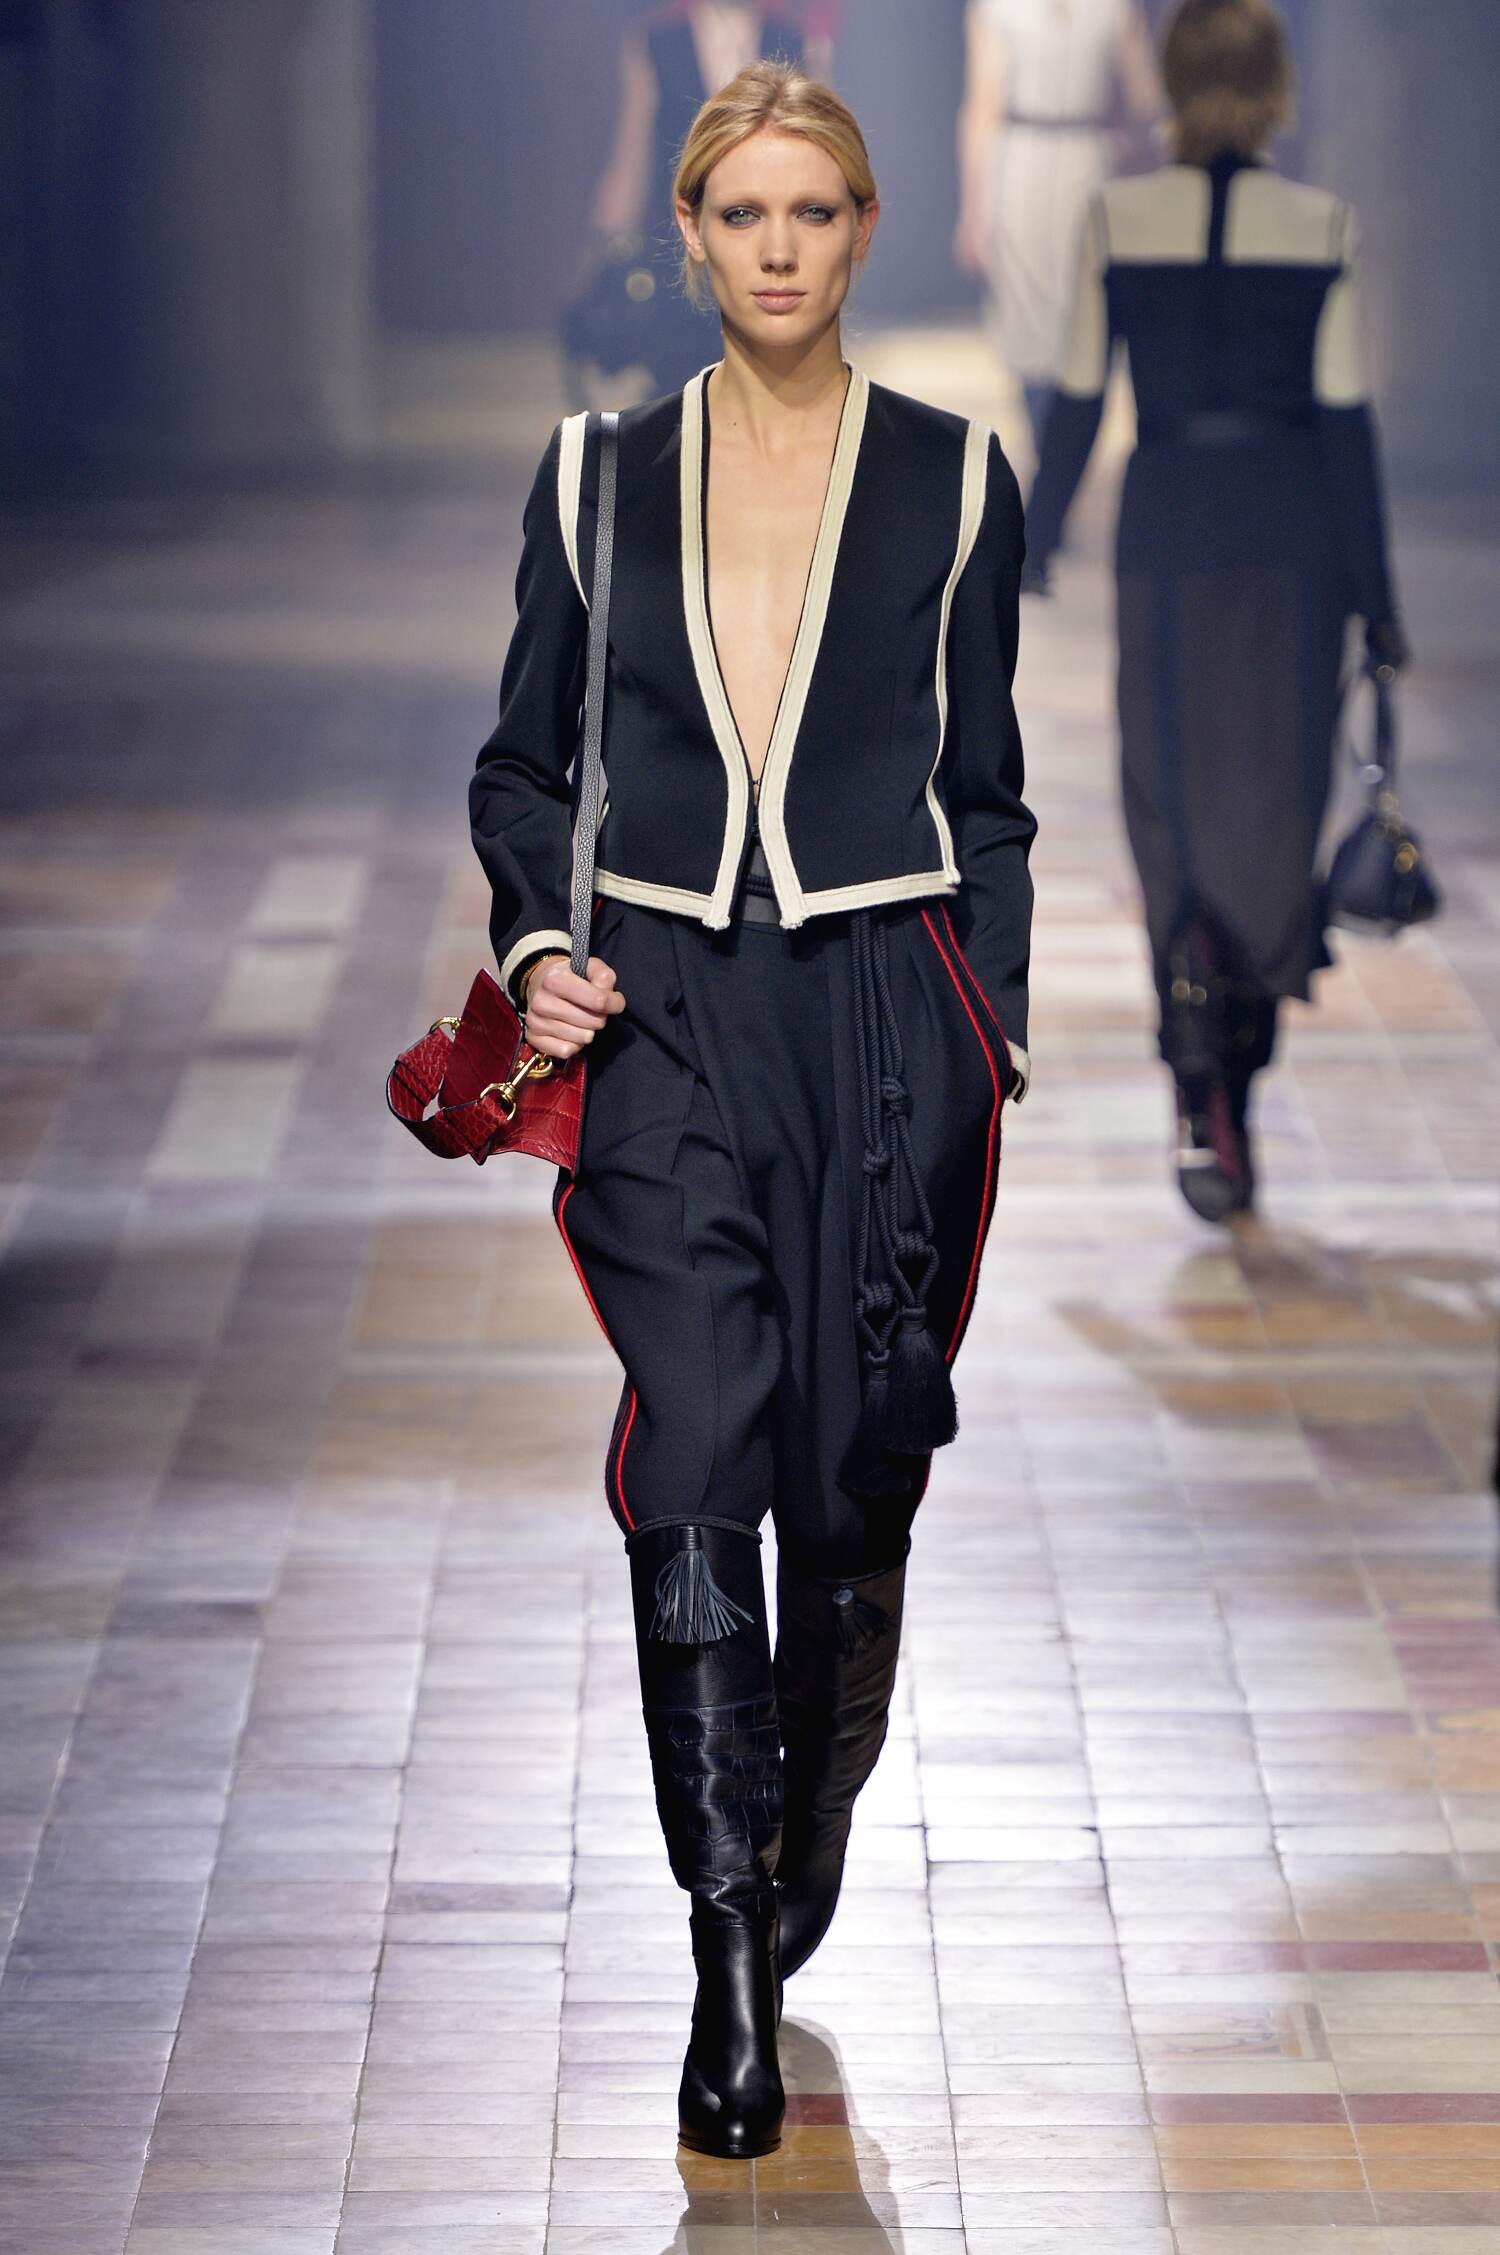 2016 Fall Fashion Woman Lanvin Collection